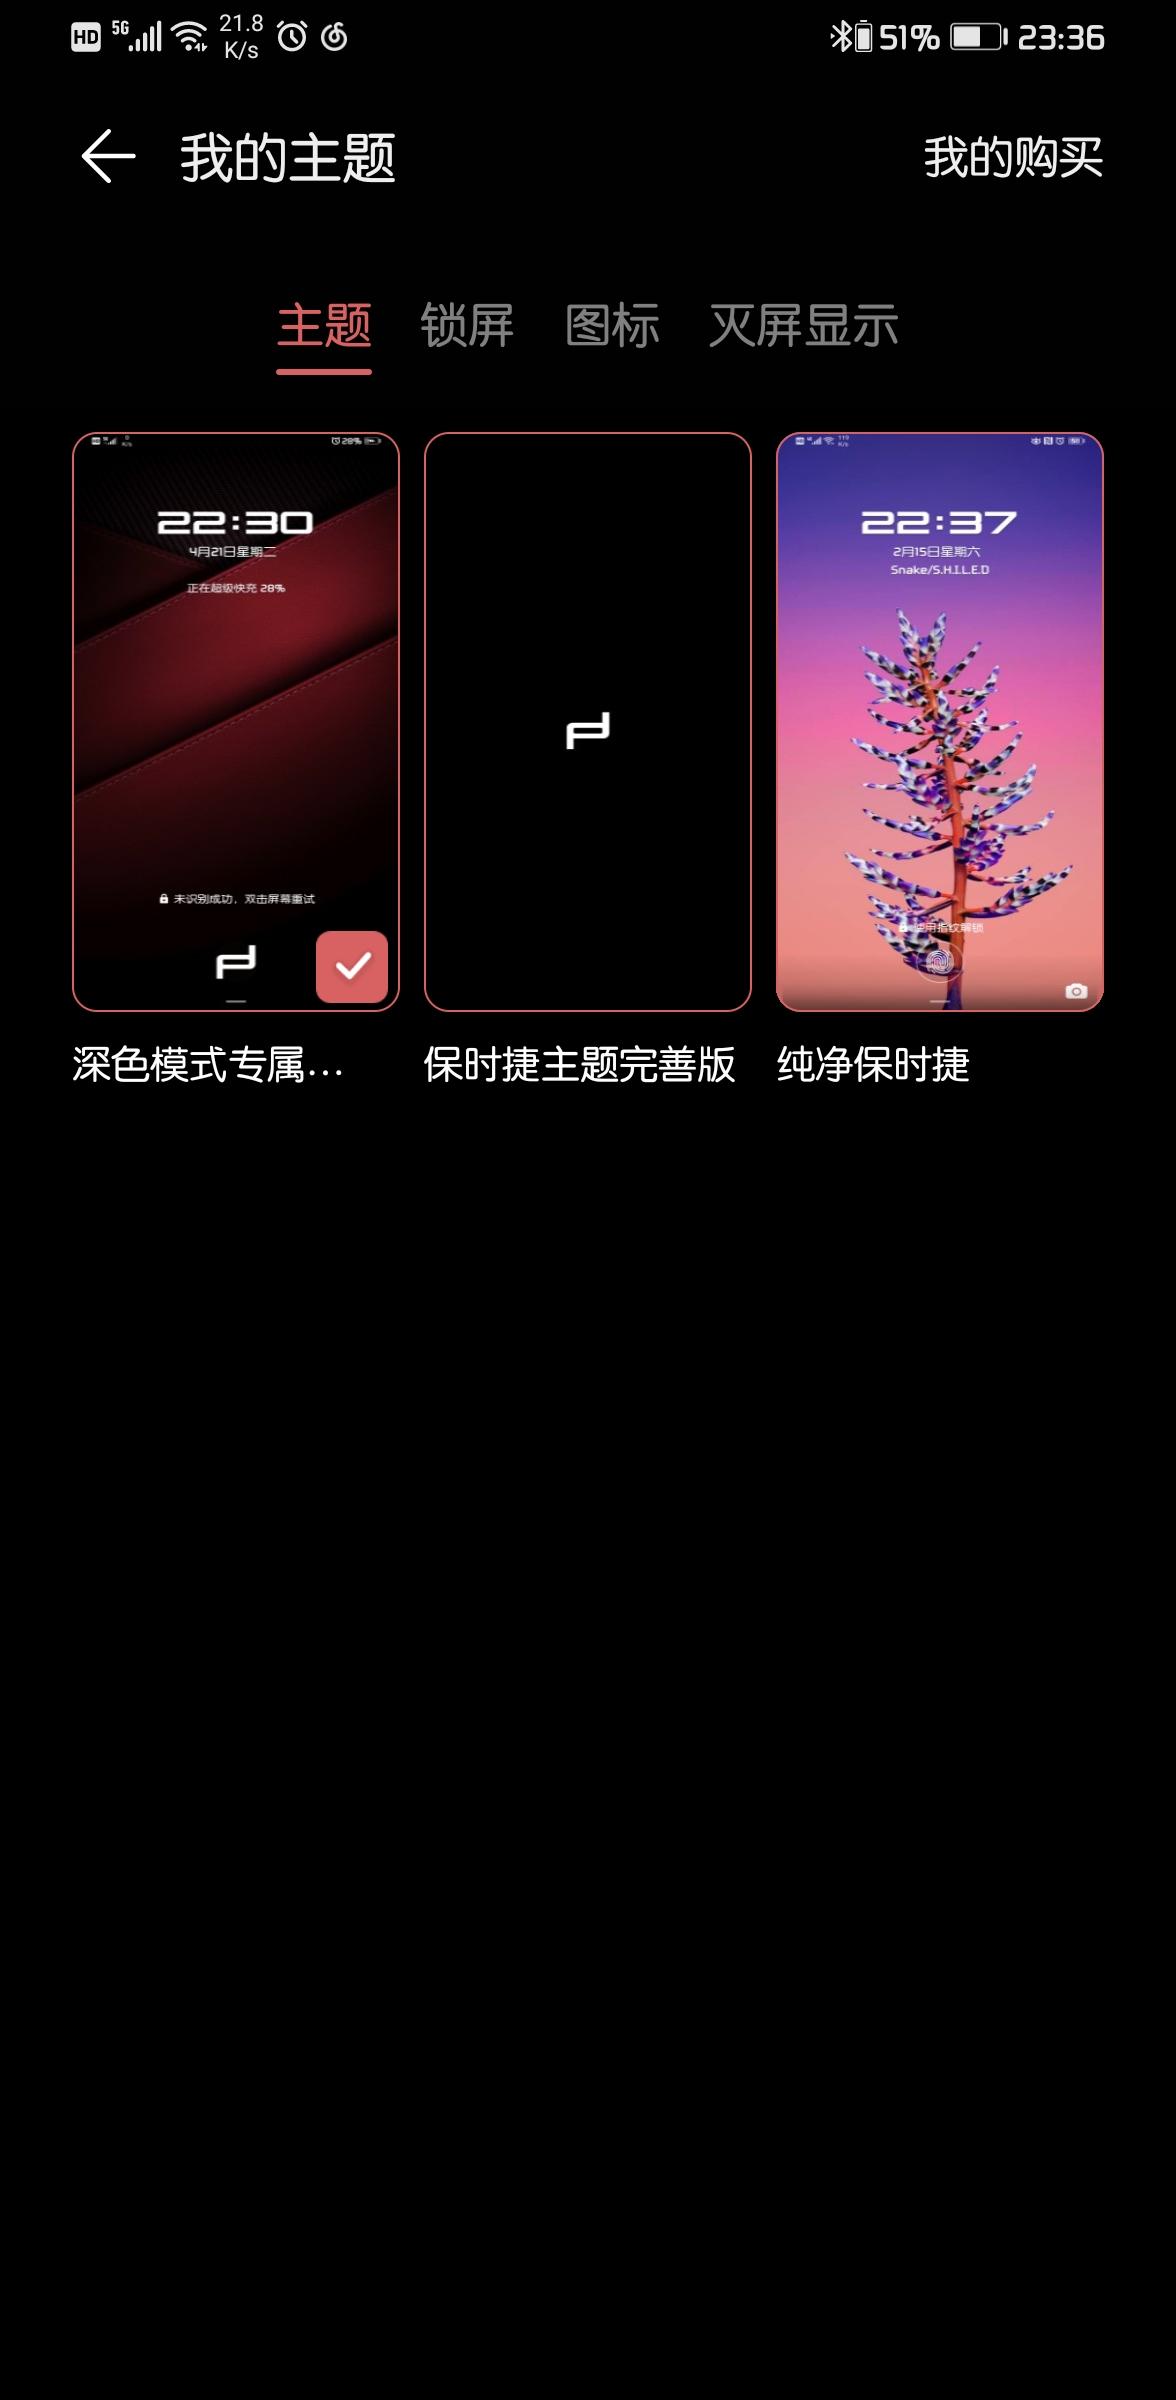 Screenshot_20200421_233607_com.huawei.android.thememanager.jpg